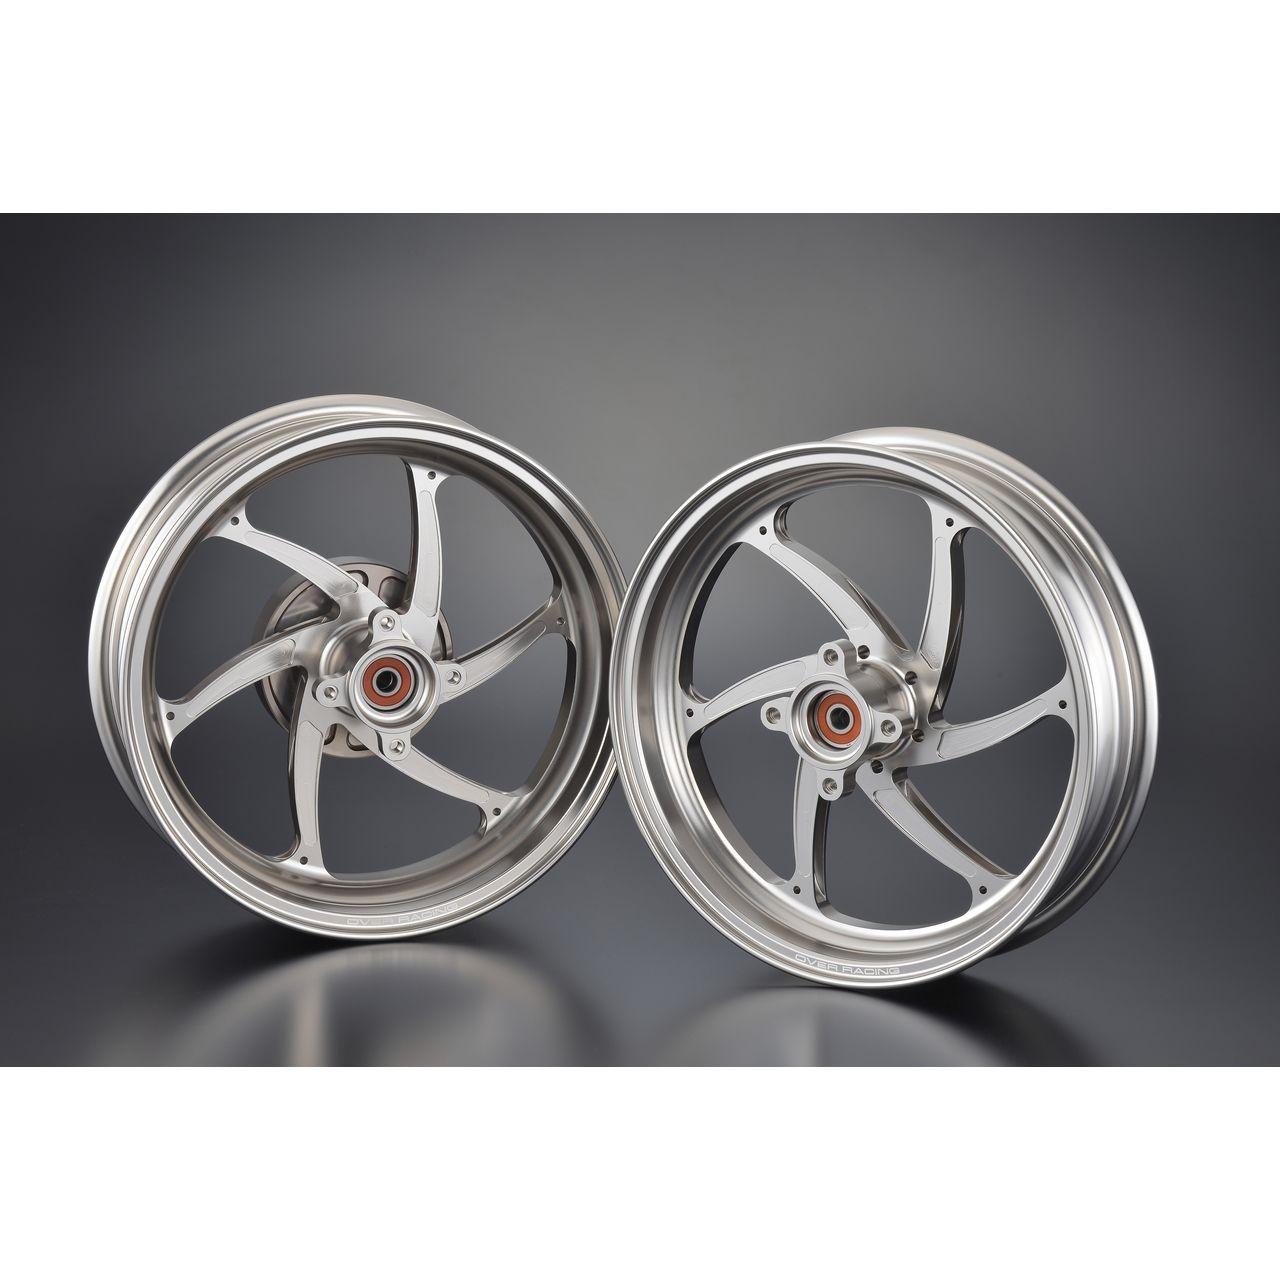 Forged Aluminum Wheel GP-SIX